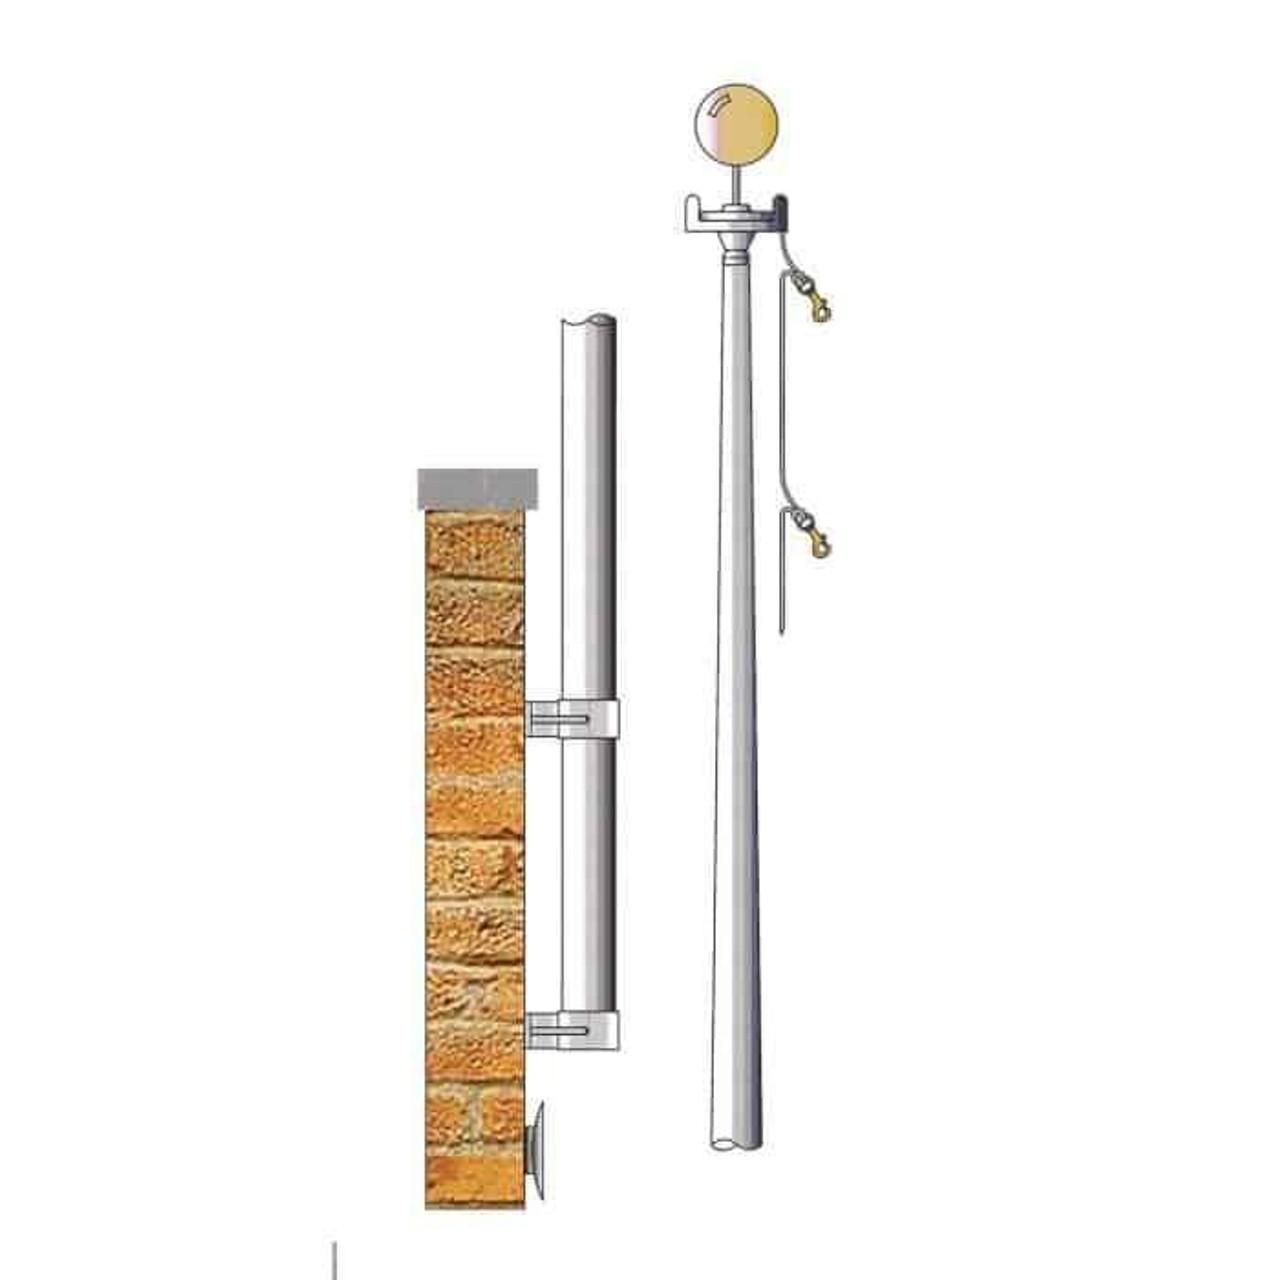 22 Vertical Wall Mounted Flagpole EVWM22